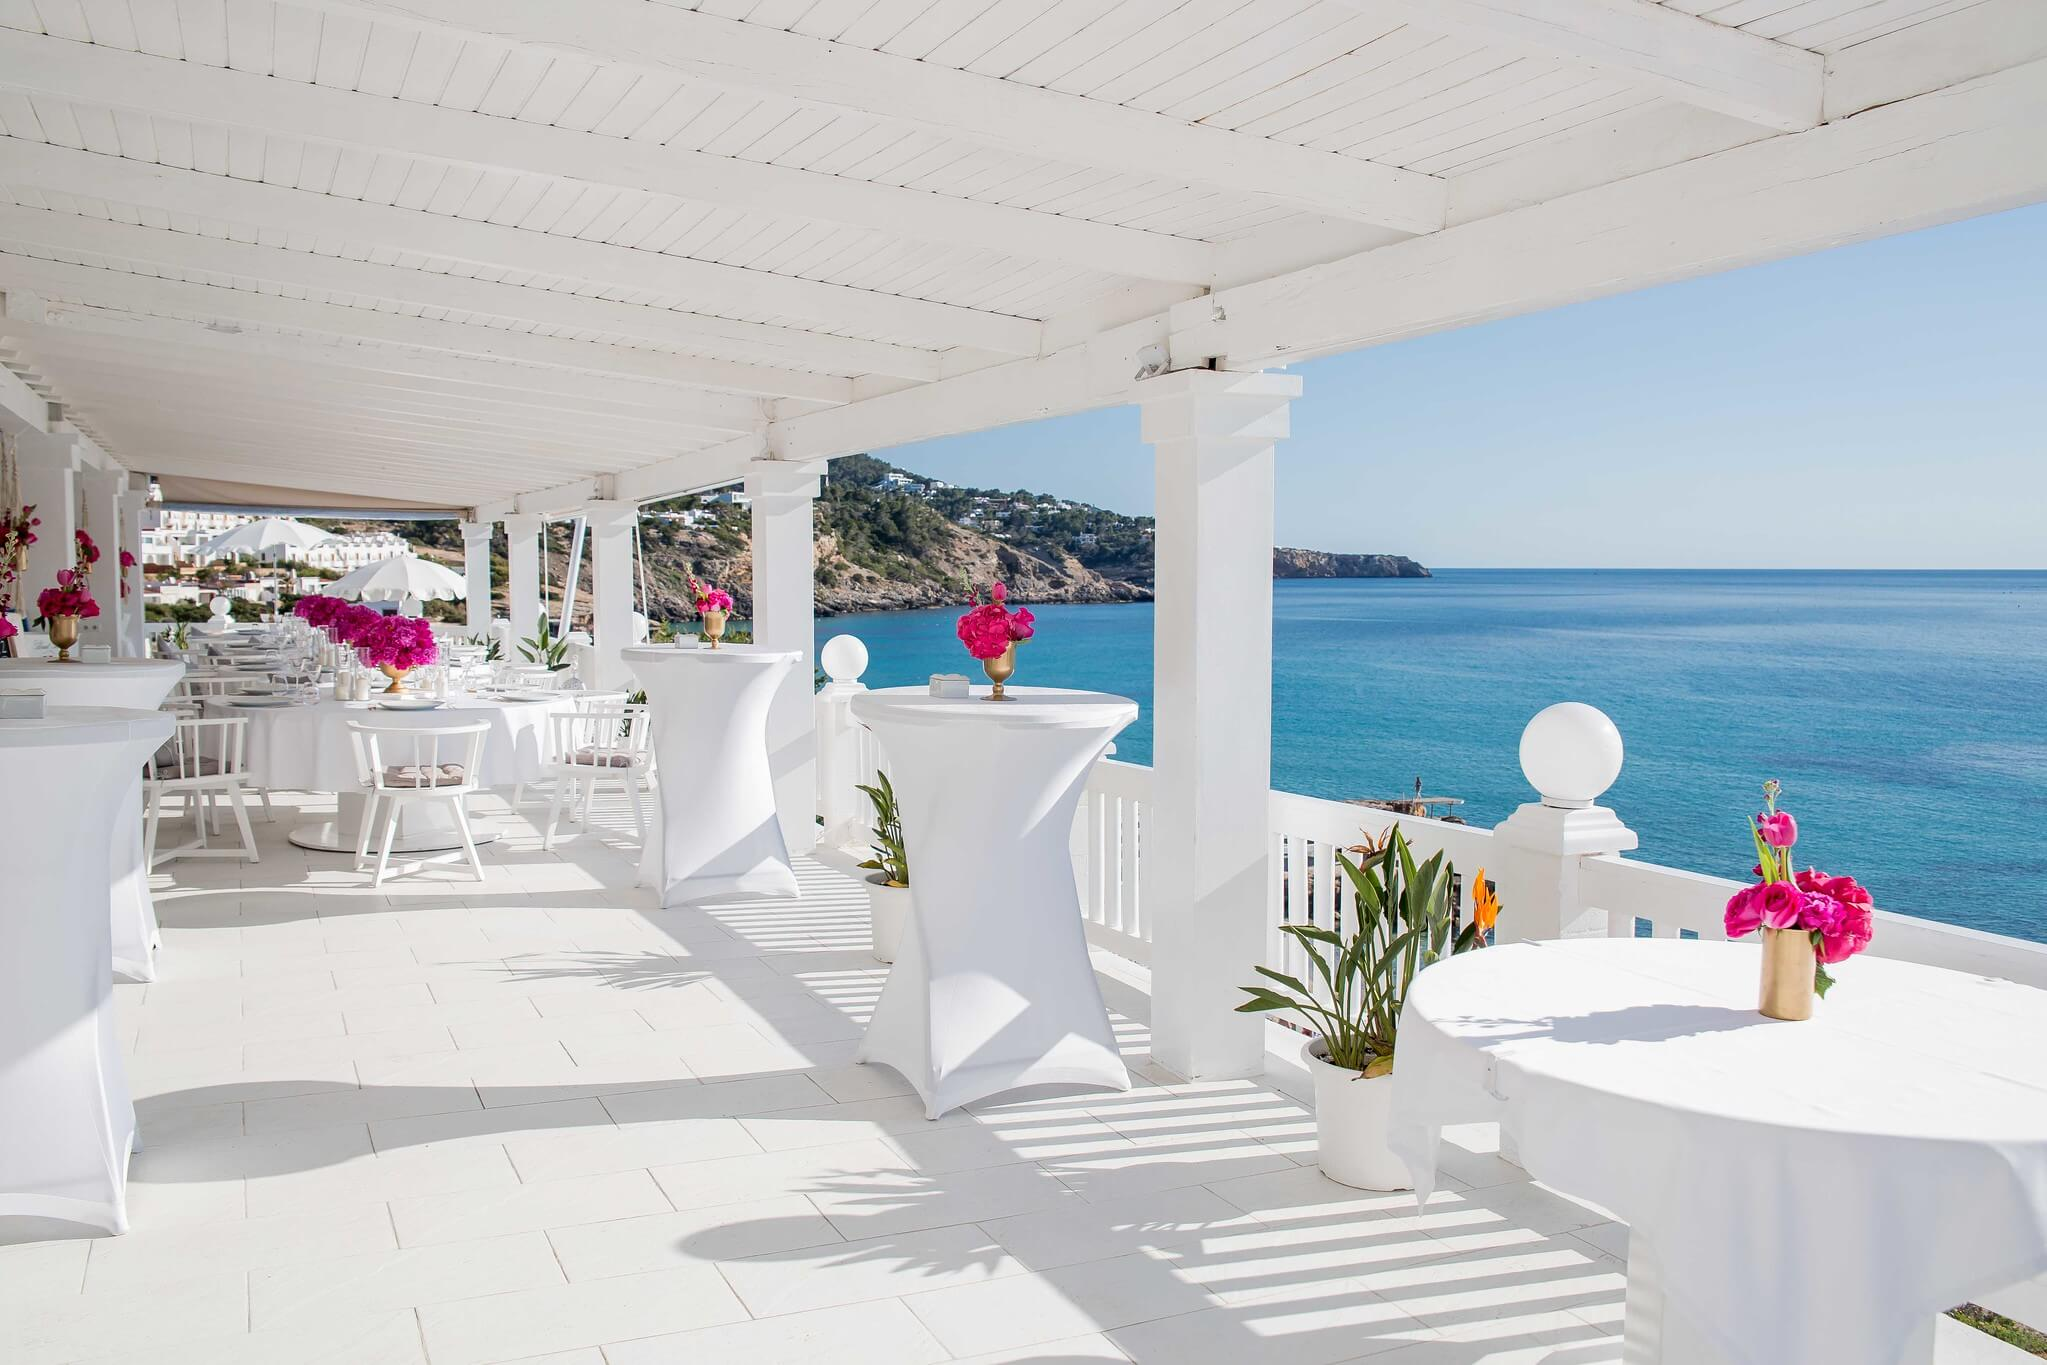 https://www.white-ibiza.com/wp-content/uploads/2020/03/ibiza-wedding-venues-cotton-beach-2020-09.jpg